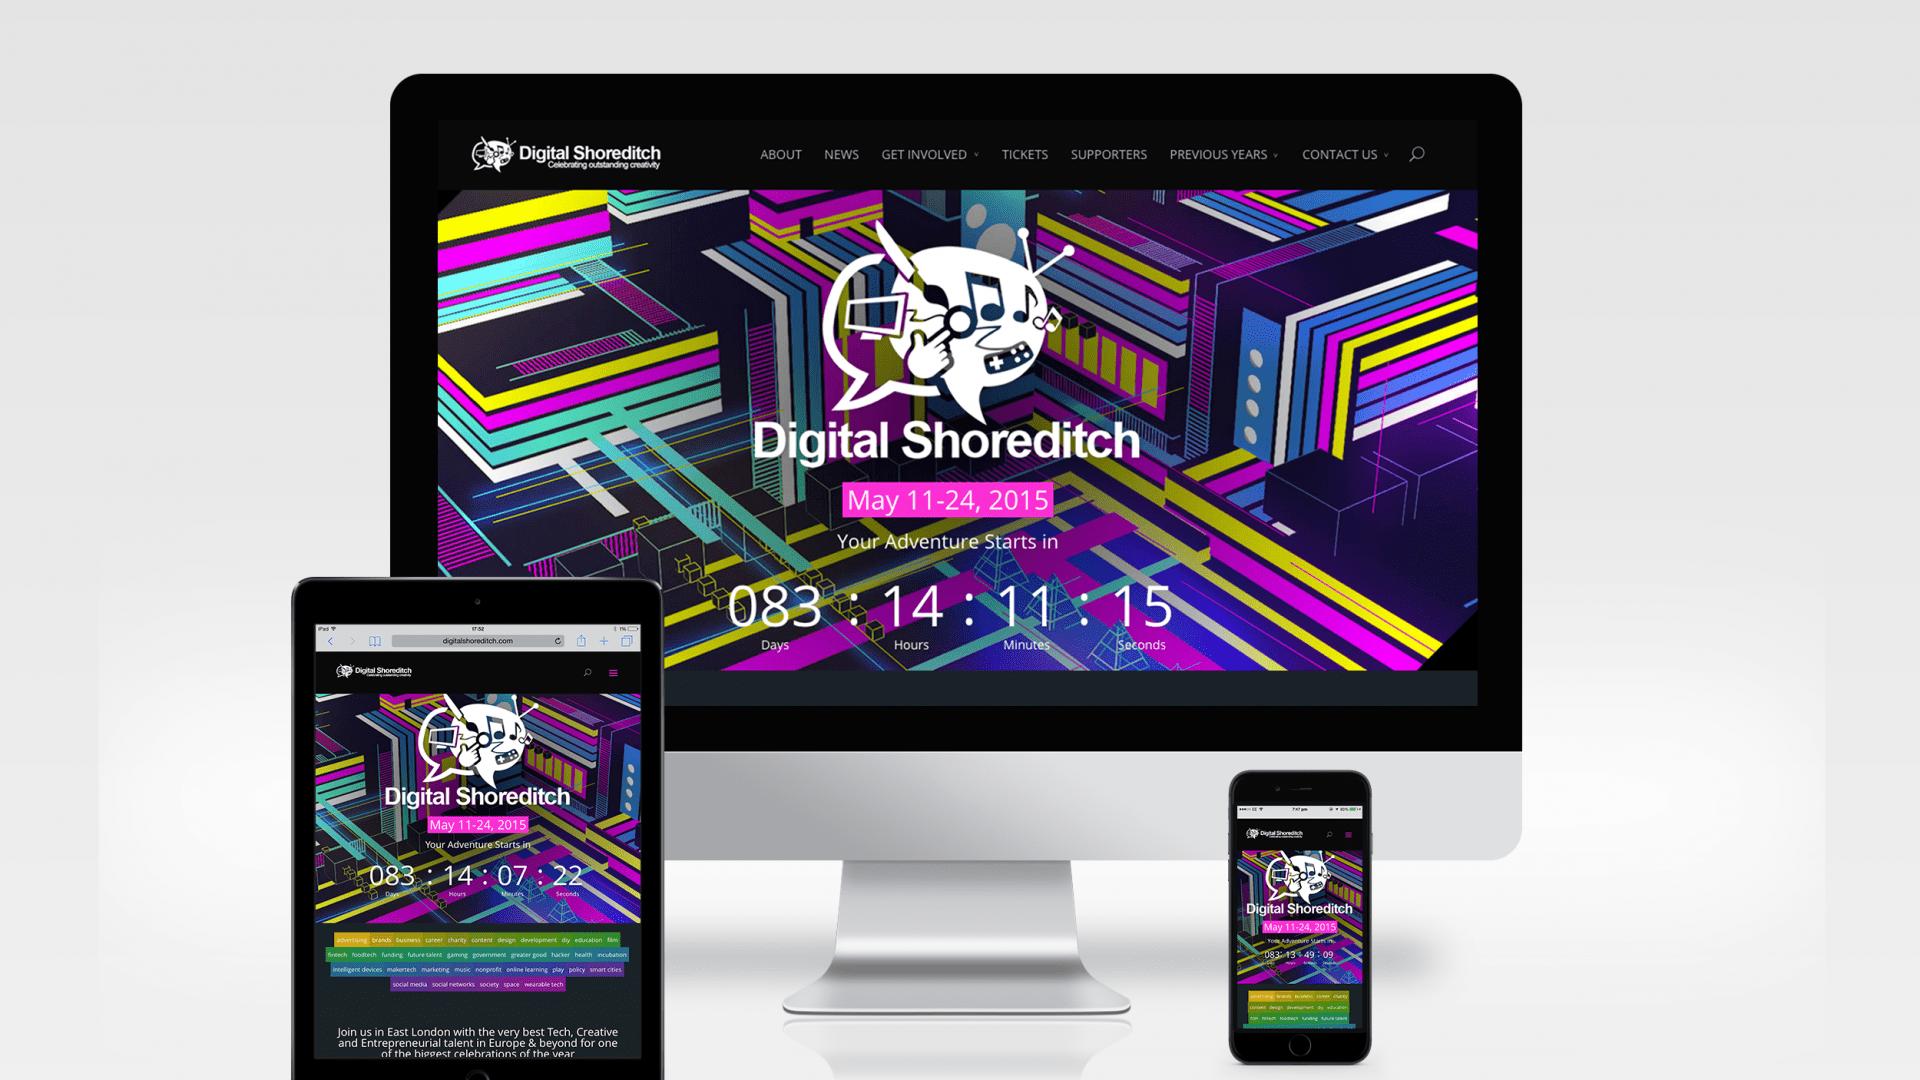 Highlights from Digital Shoreditch 2015